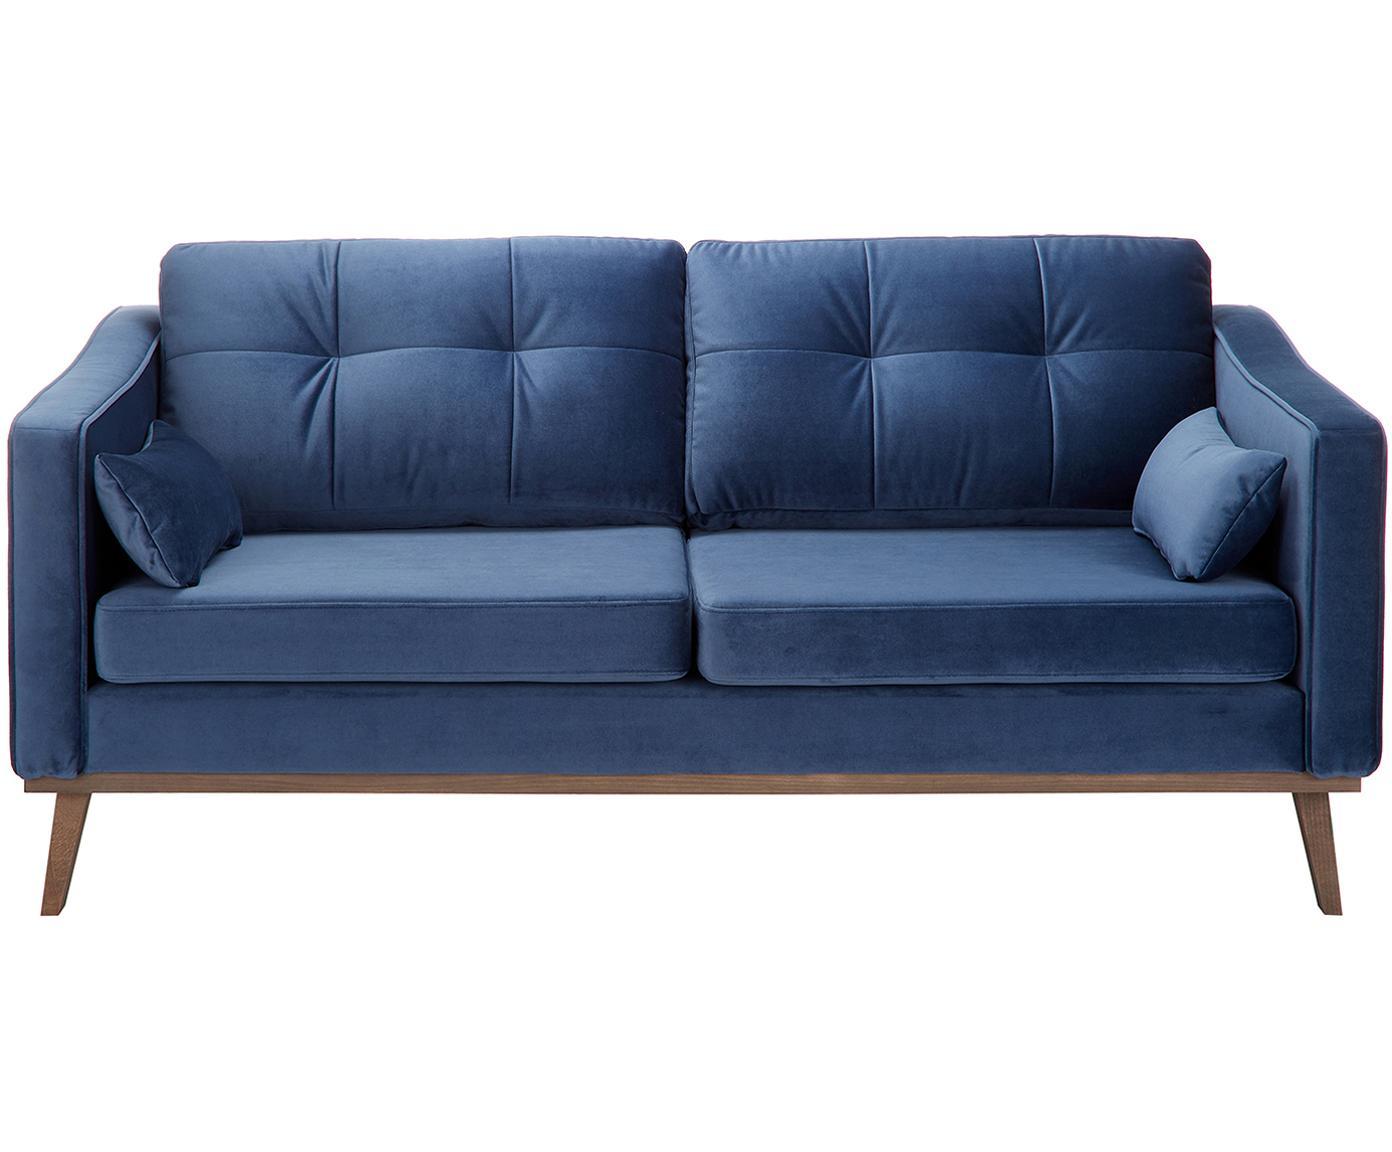 Samt-Sofa Alva (2-Sitzer), Bezug: Samt (Hochwertiger Polyes, Gestell: Massives Kiefernholz, Samt Dunkelblau, B 184 x T 92 cm